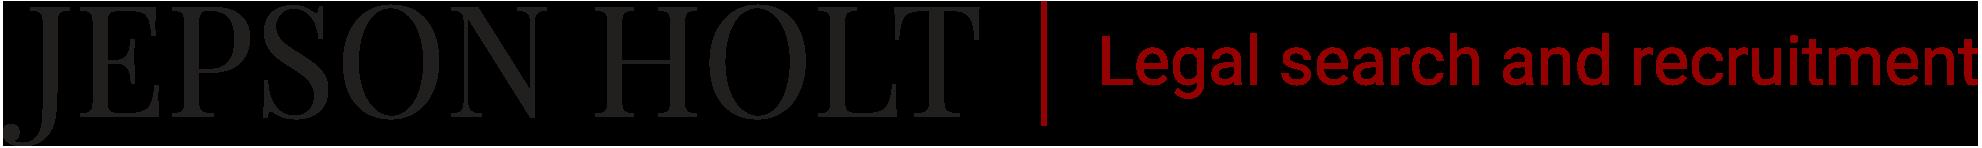 Jepson Holt Logo